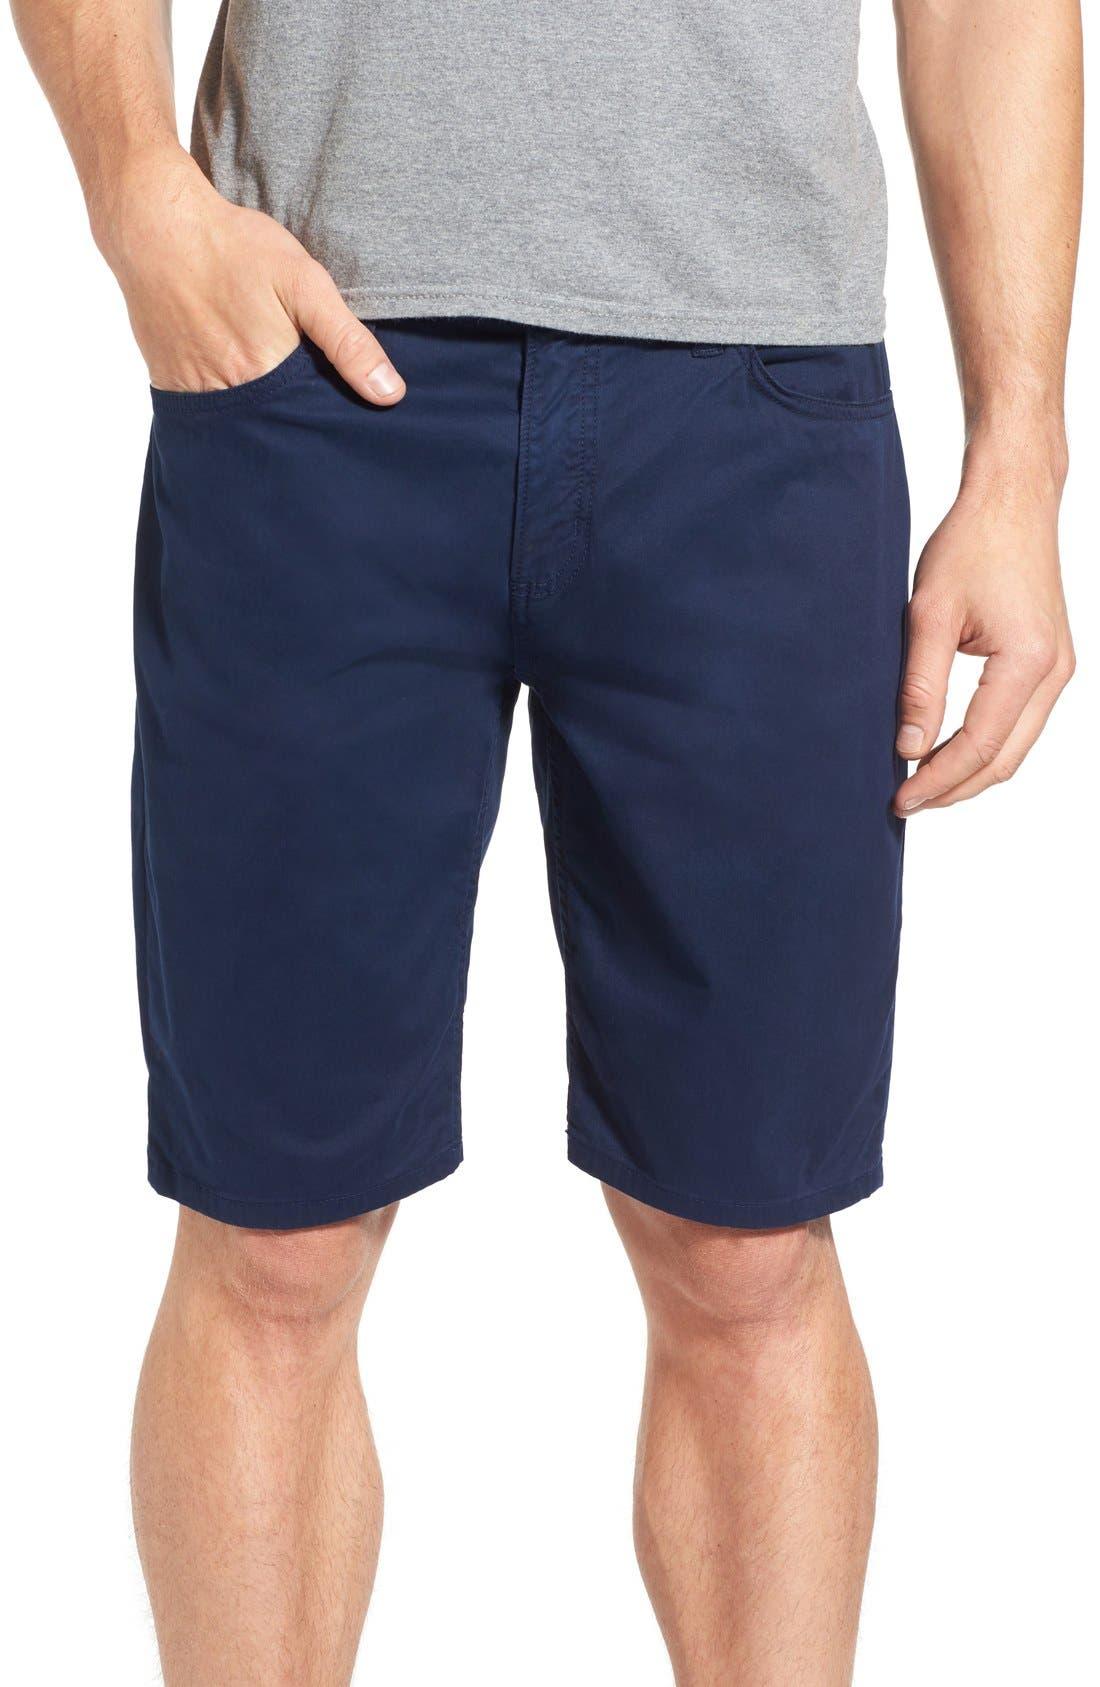 ORIGINAL PAPERBACKS 'Los Feliz' Shorts